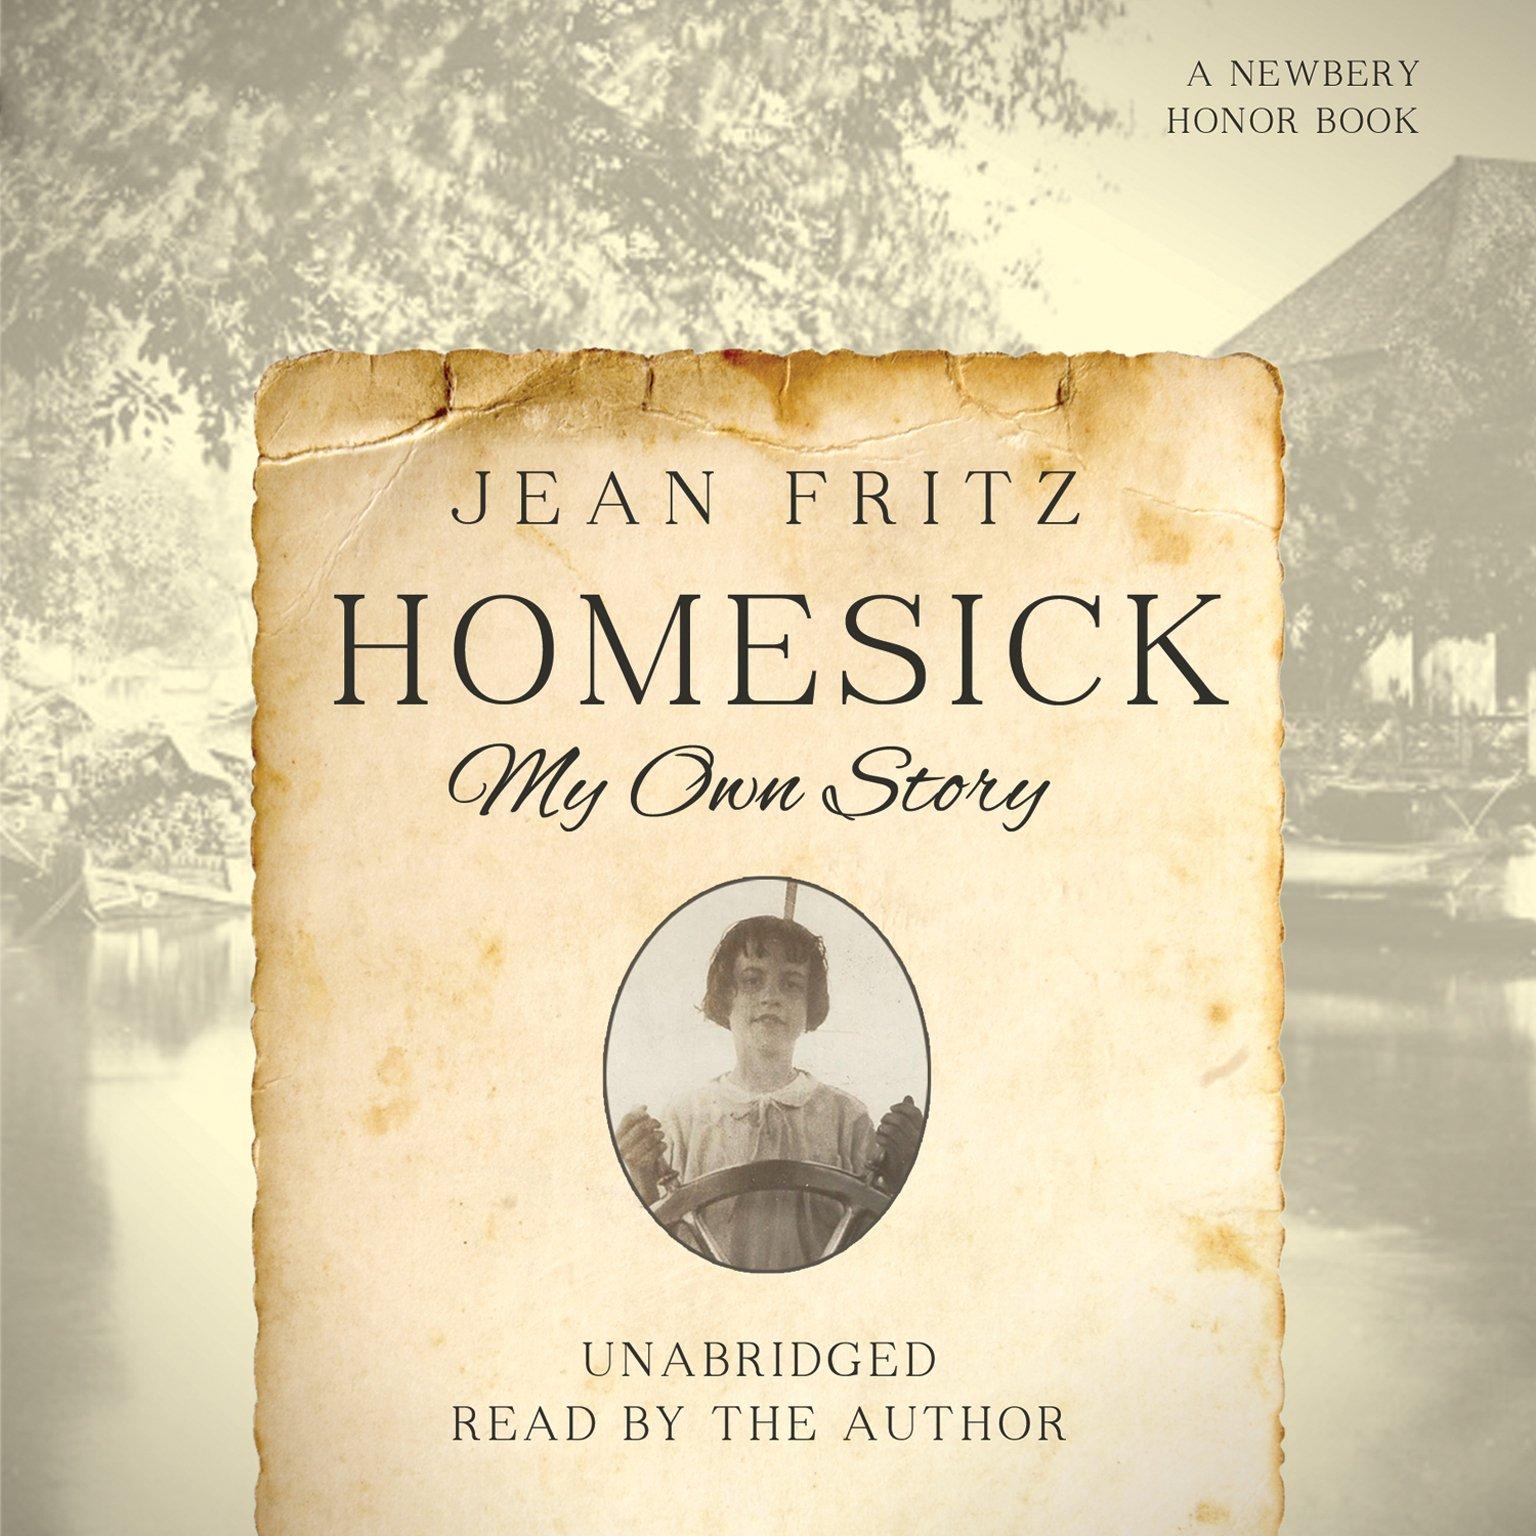 Homesick: My Own Story